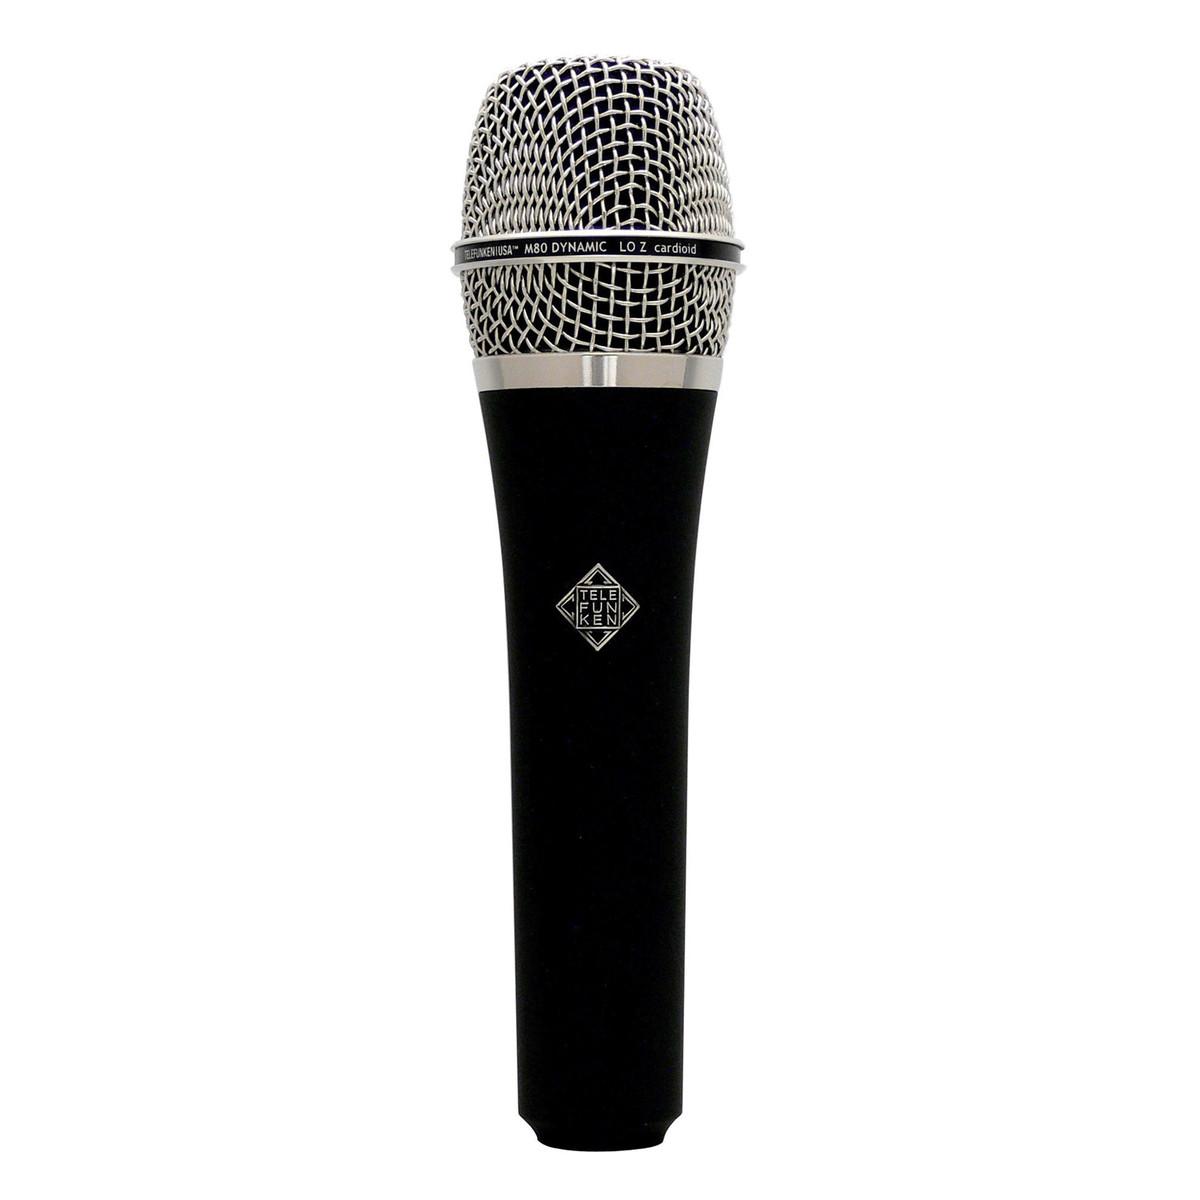 Telefunken AR 51 Tube Condenser Microphone | Gear4music